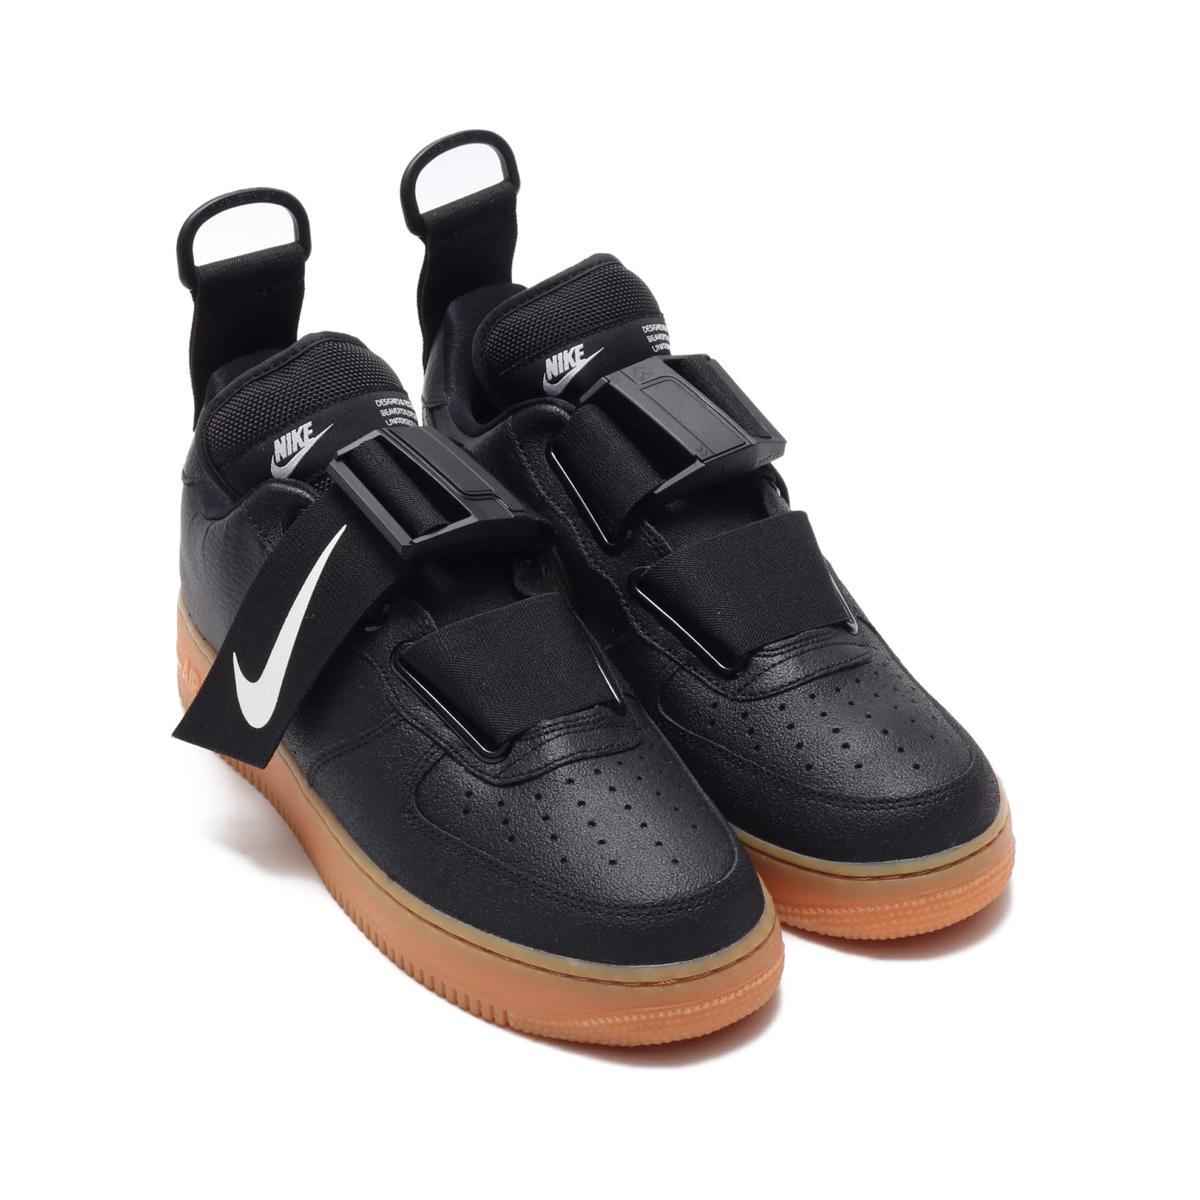 free shipping 1722b 438a4 NIKE AIR FORCE 1 UTILITY (Nike air force 1 utility) BLACKWHITE-GUM MED  BROWN 18HO-S